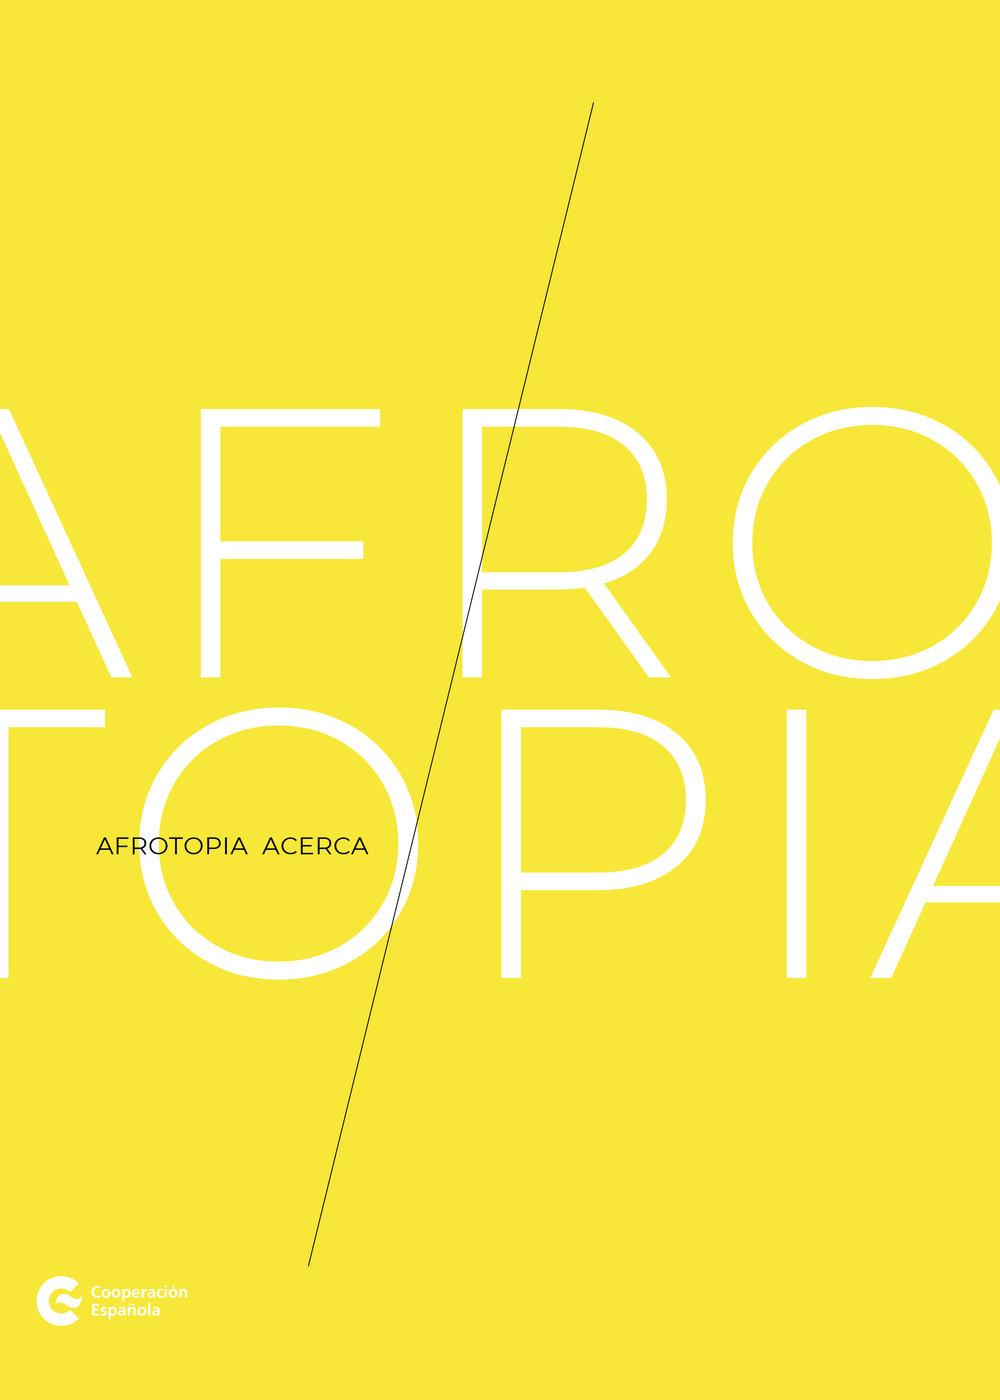 AFROTOPIA ACERCA -